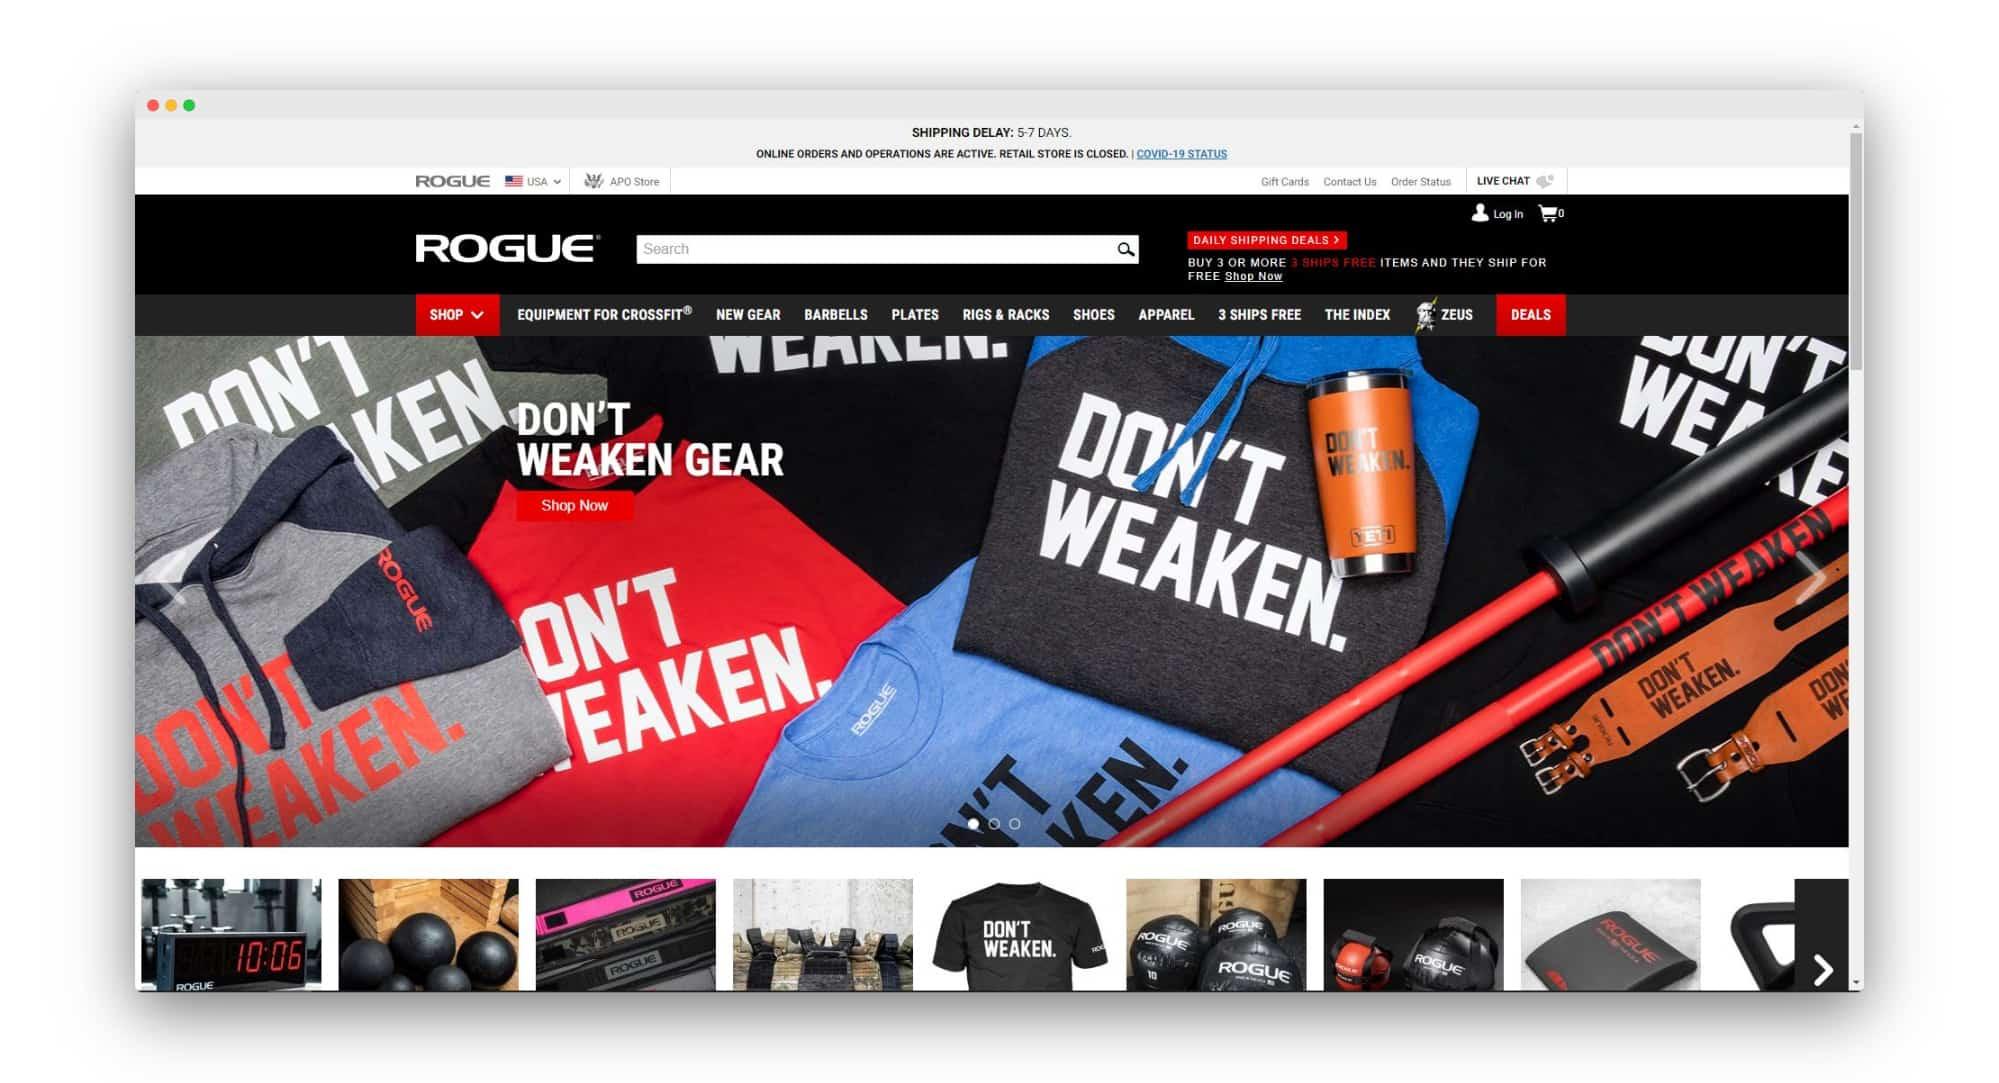 Rogue DTC Brands